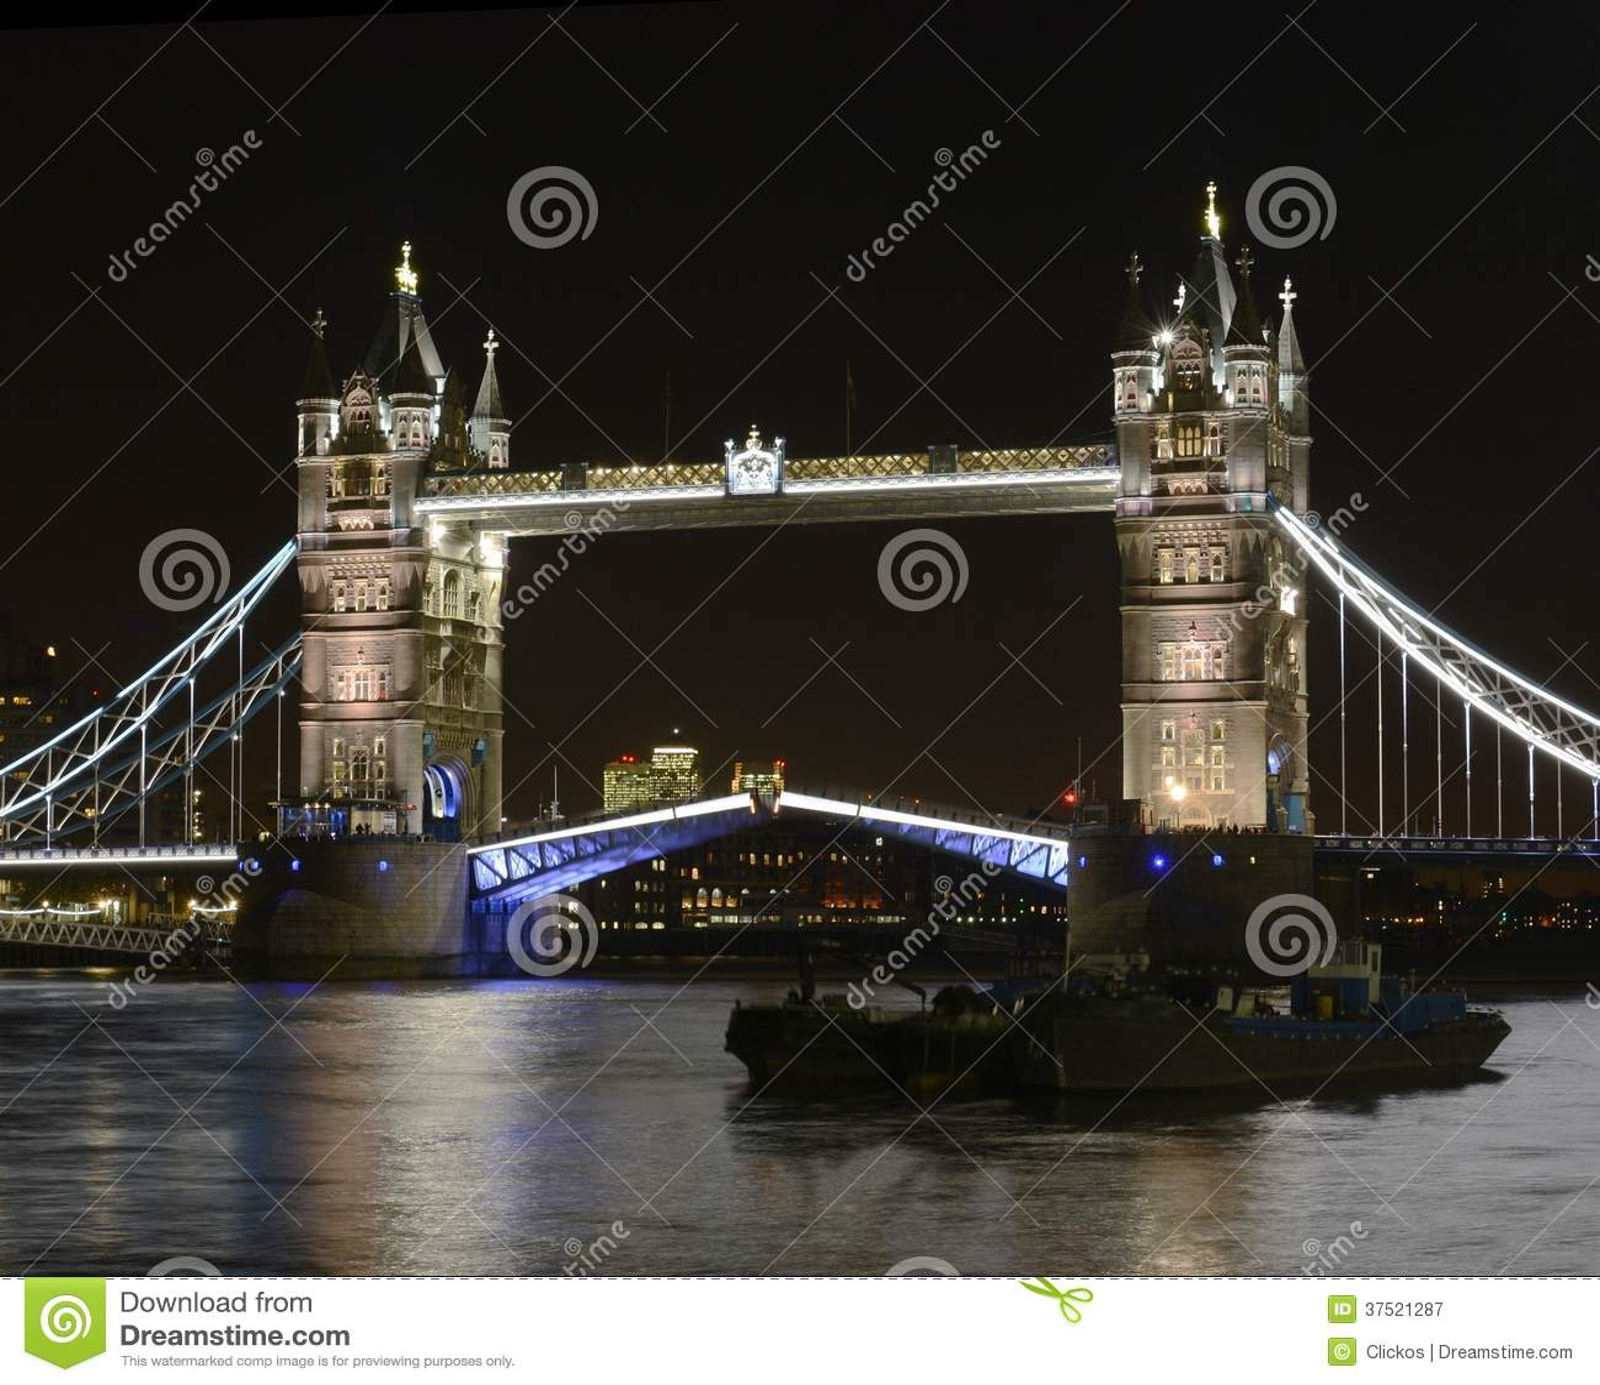 Turm-Brücke nachts. London. England